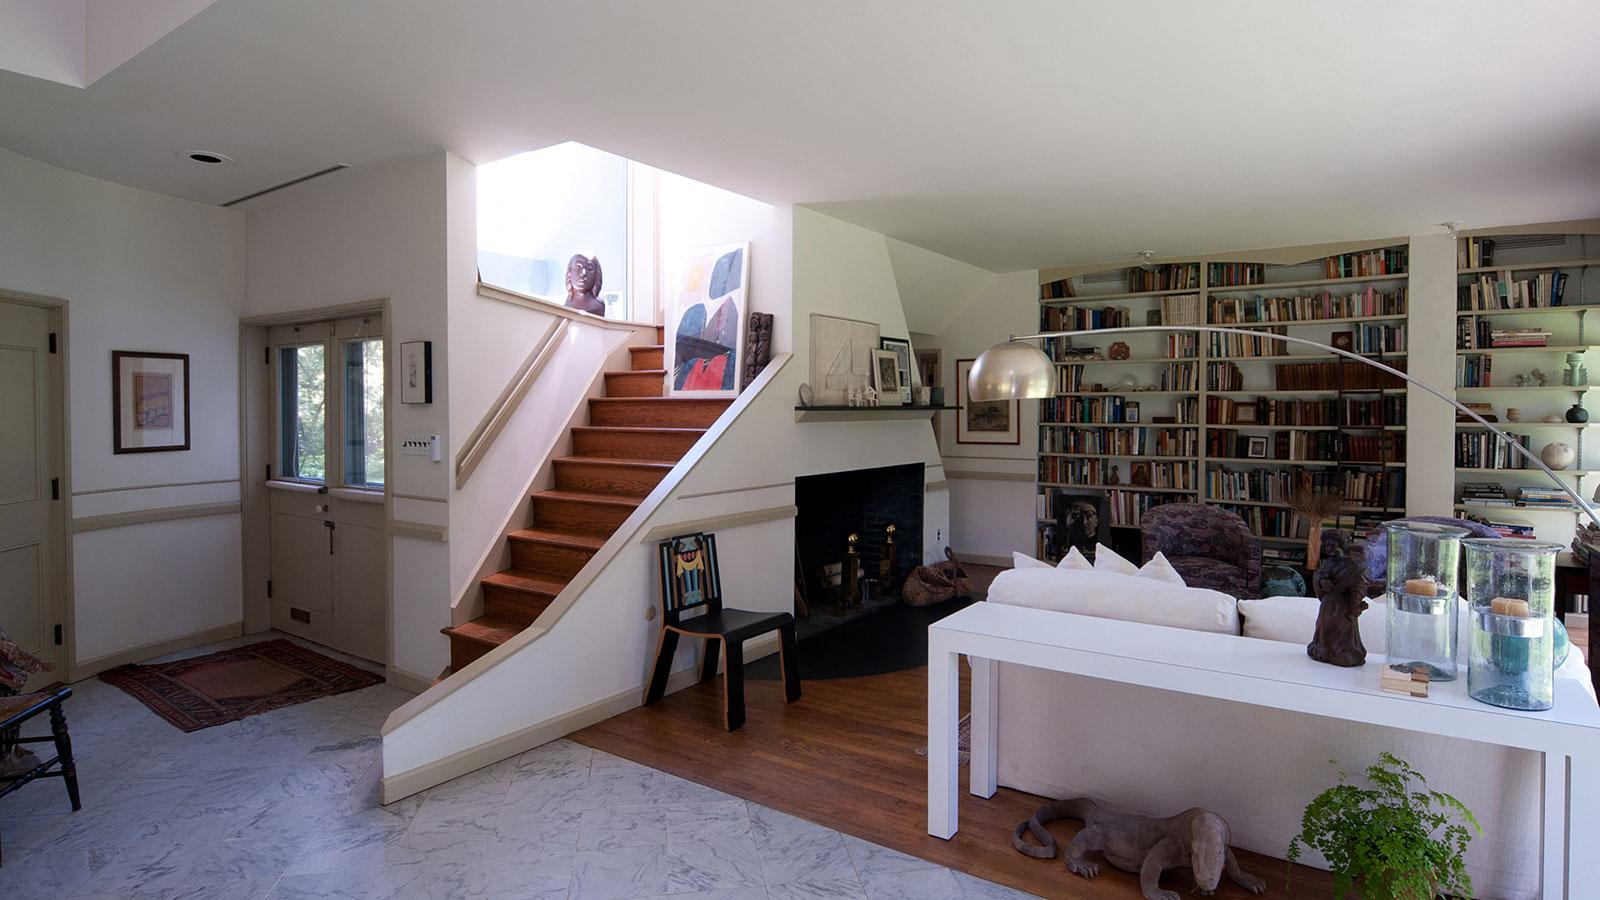 4 Bedroom Apartments In Dc Arch161 Vanna Venturi House